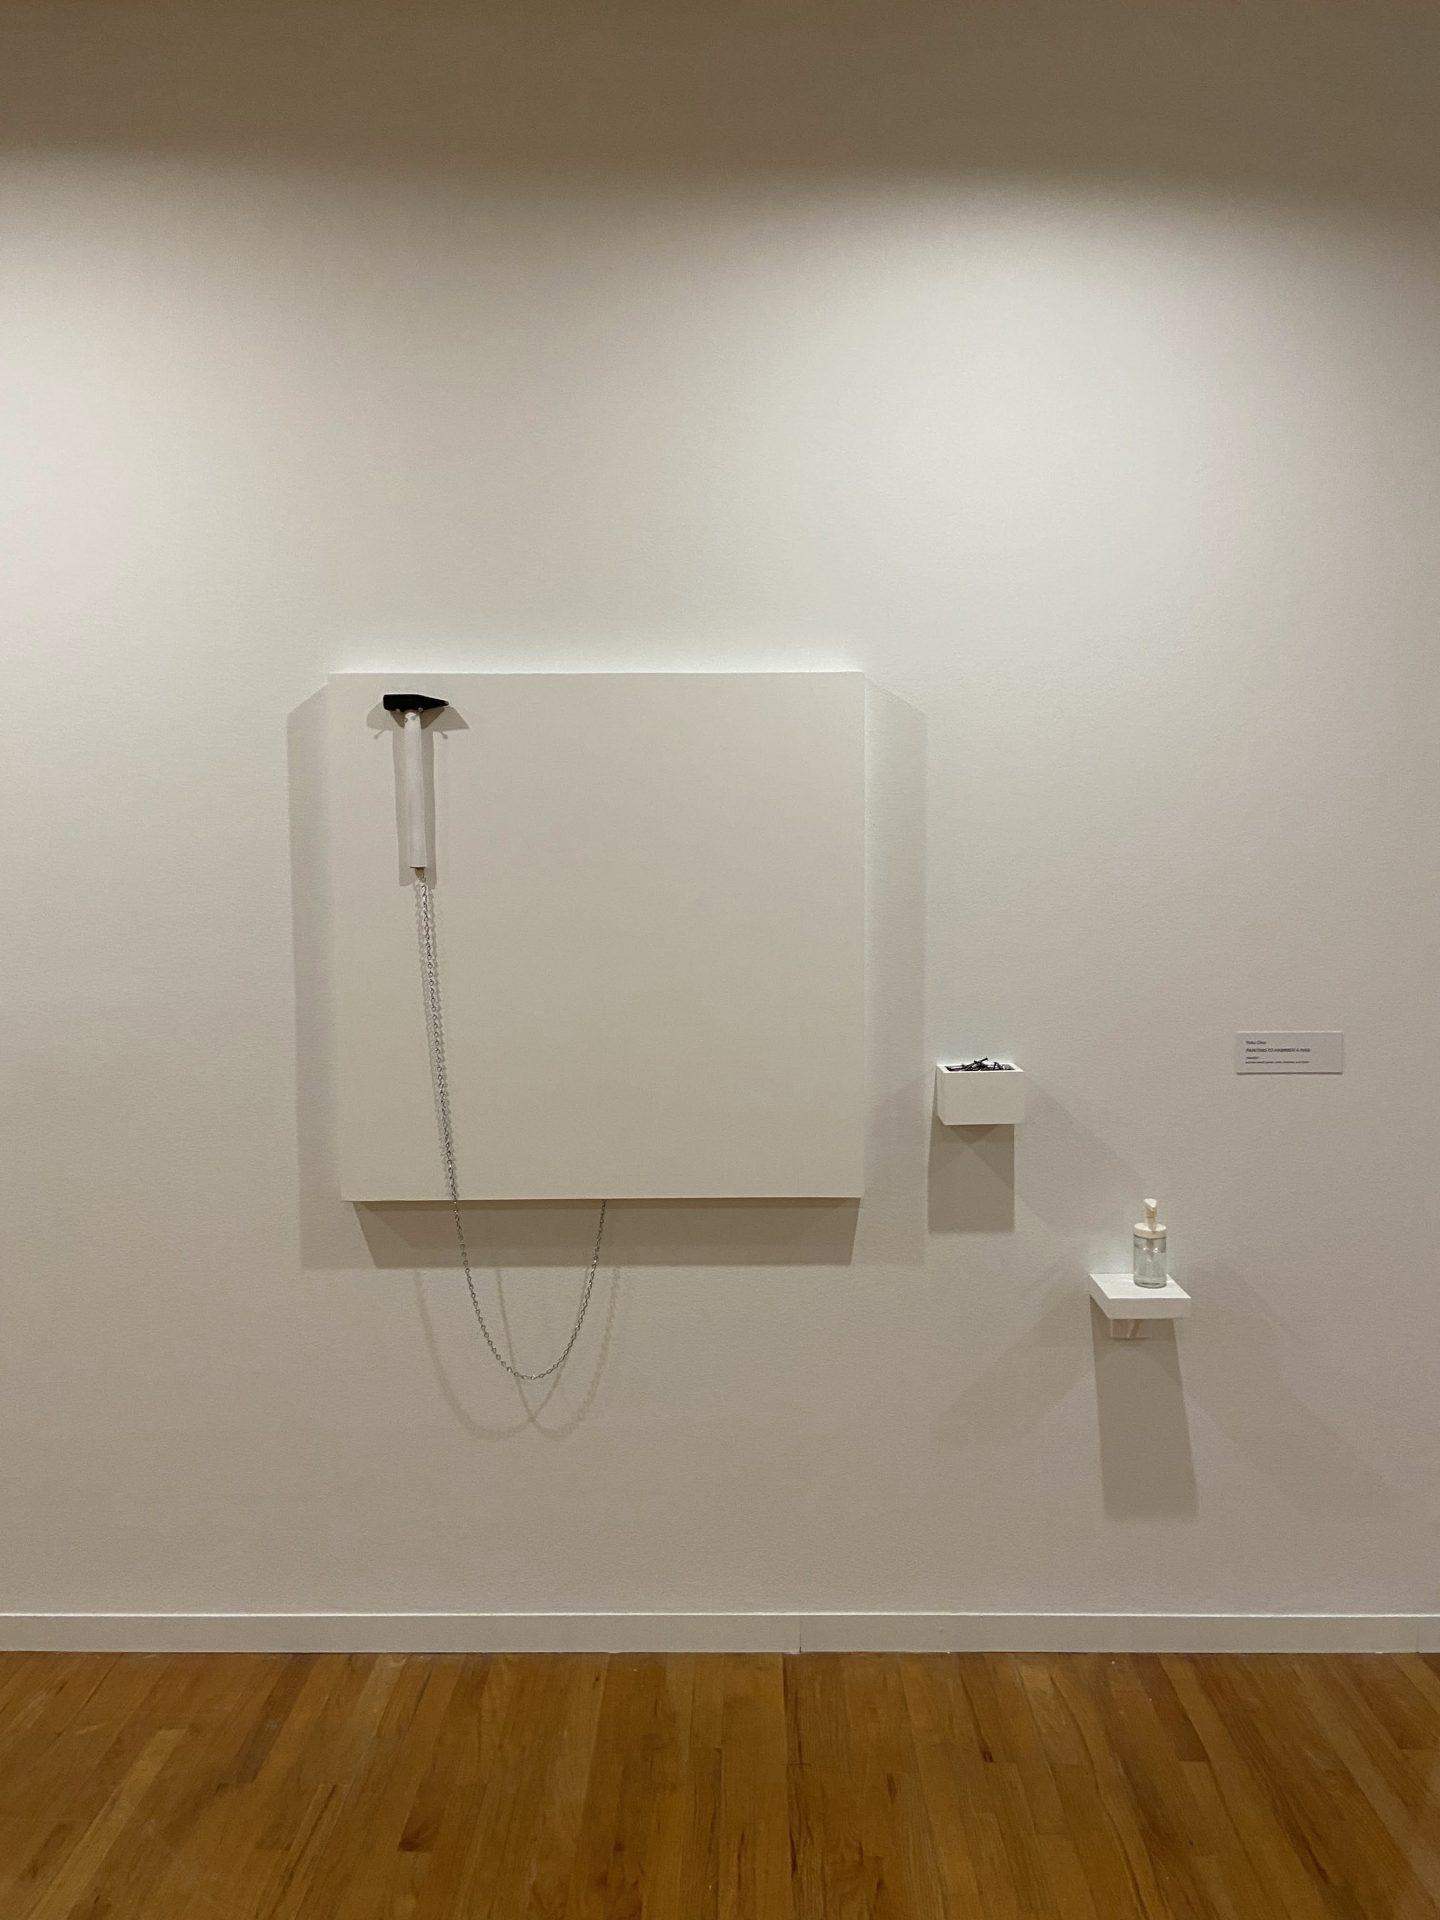 Yoko ono vancouver exhibit